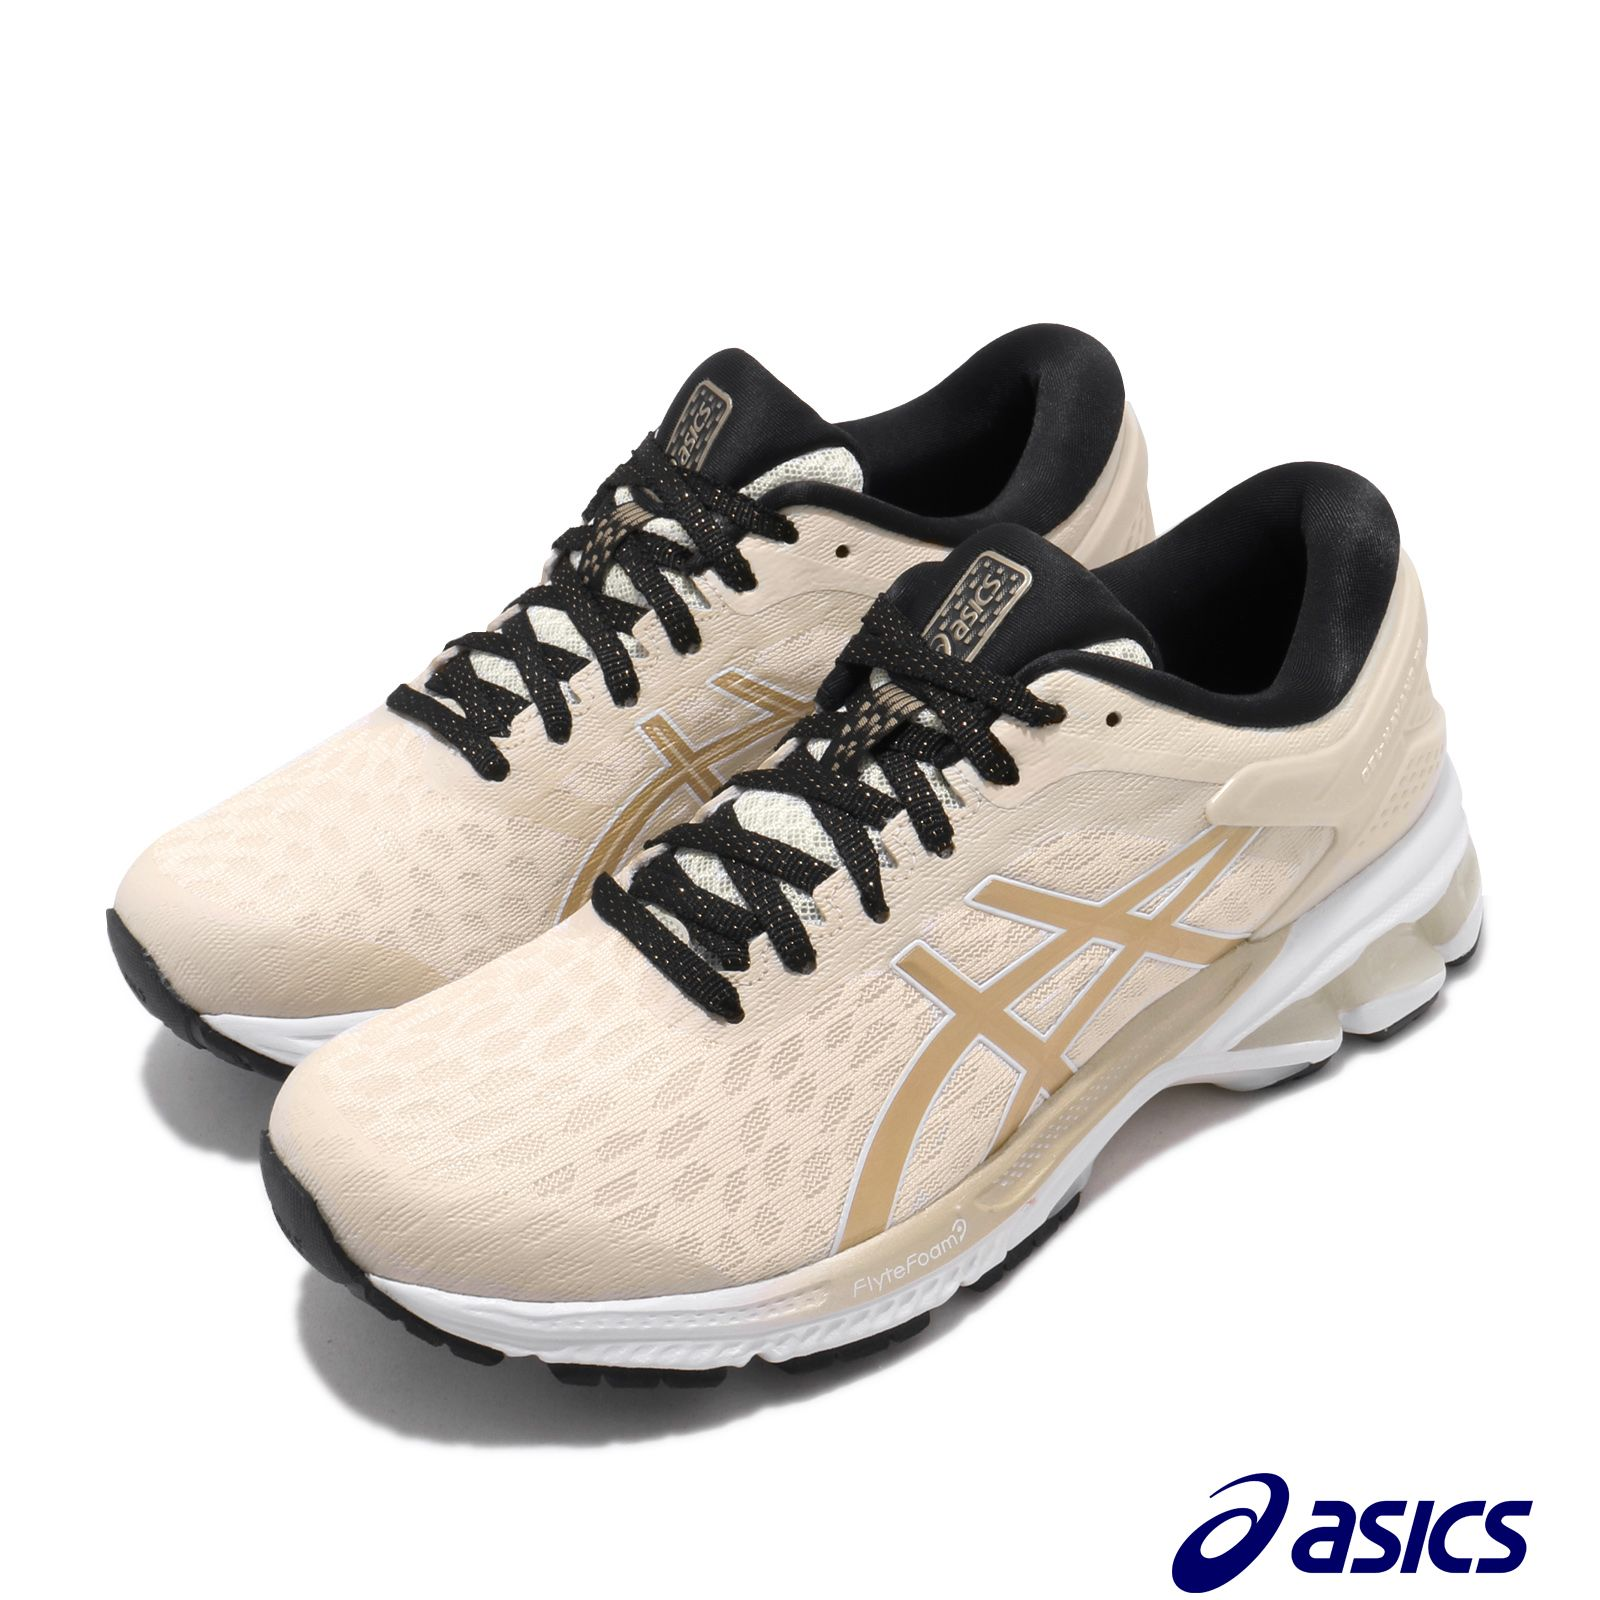 Asics 慢跑鞋 Gel-Kayano 26 運動 女鞋 1012A655200